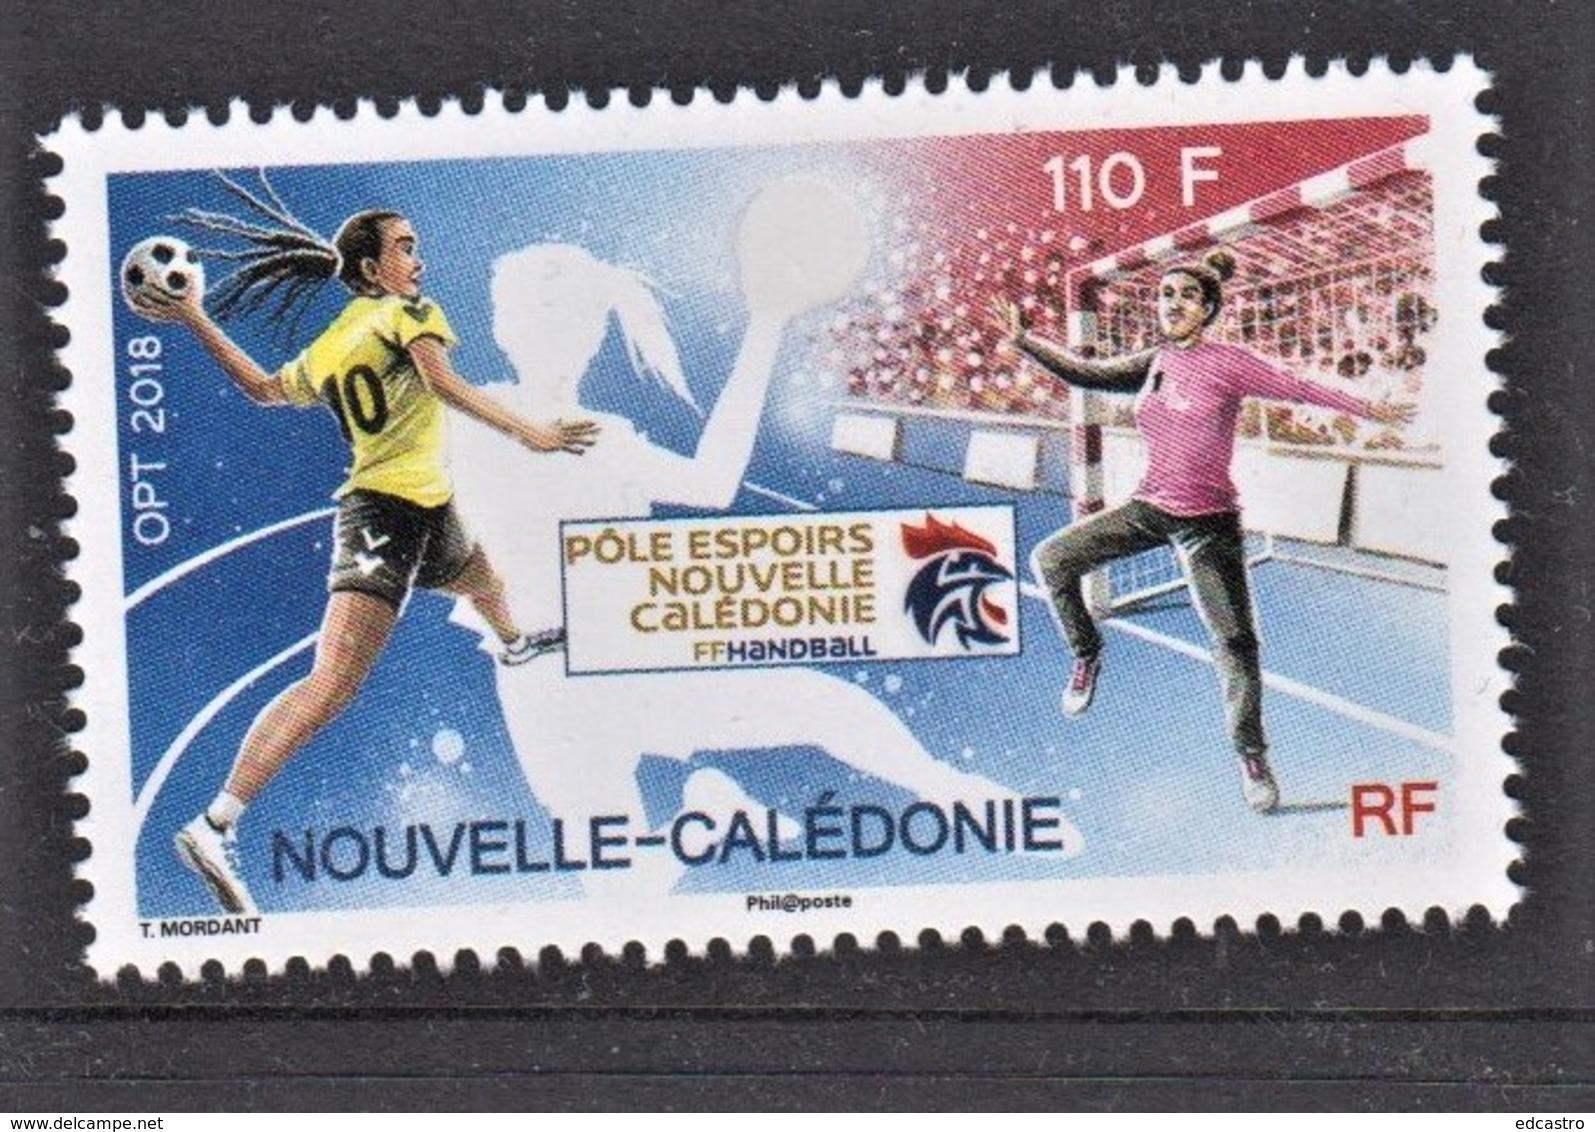 1.- NEW CALEDONIE 2019 Women's Handball Hopes Pole - Balonmano